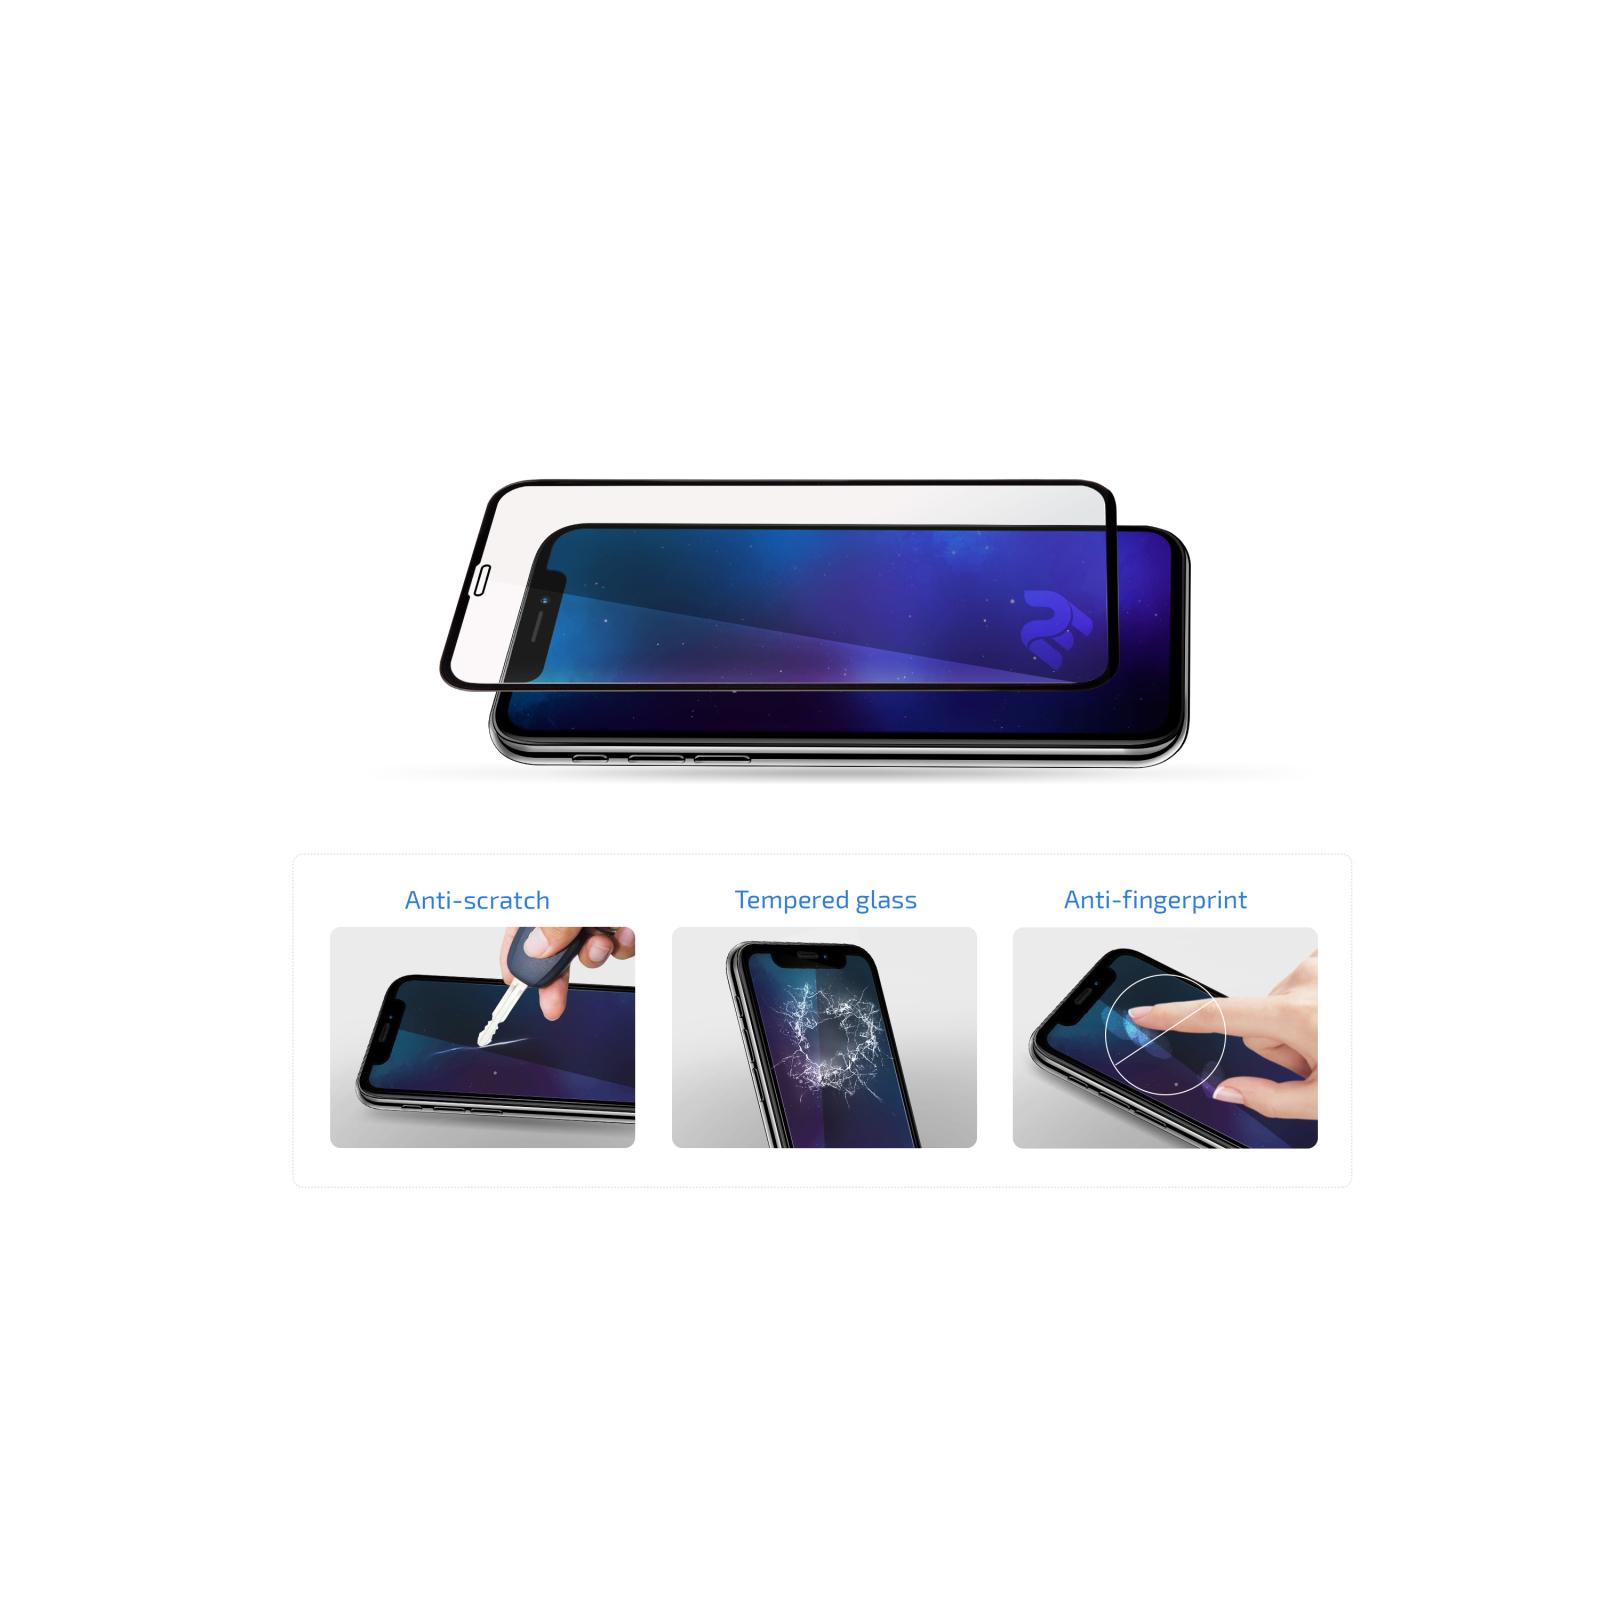 Скло захисне 2E Basic Xiaomi Redmi Note 9, 2.5D FCFG, black border (2E-MI-N9-SMFCFG-BB) зображення 3